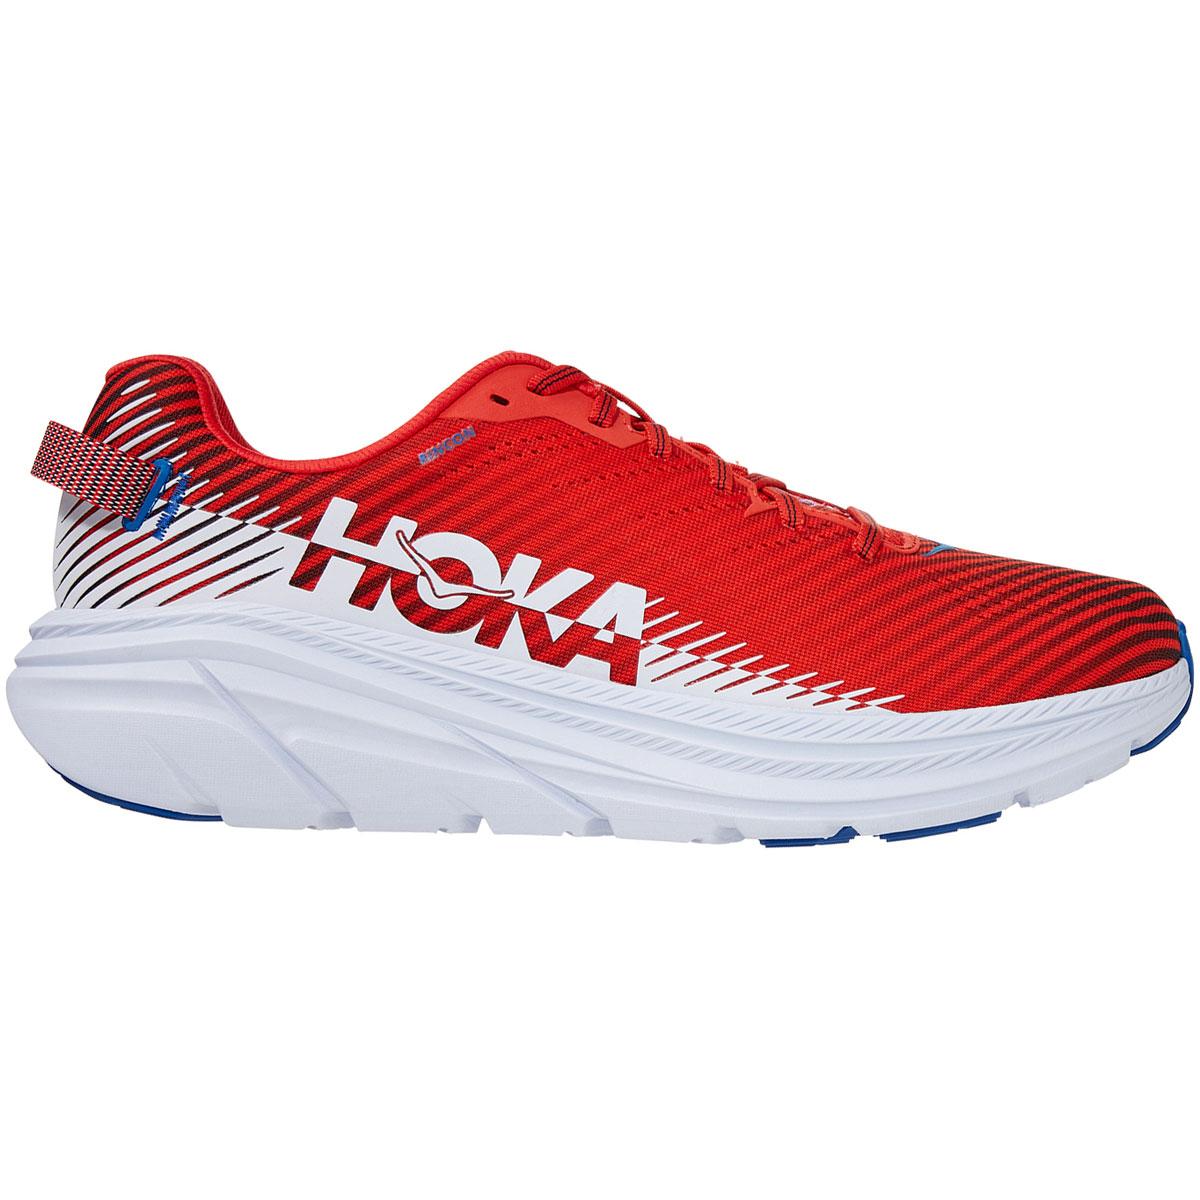 Men's Hoka One One Rincon 2 Running Shoe - Color: Fiesta/Turkish White - Size: 7 - Width: Regular, Fiesta/Turkish White, large, image 1